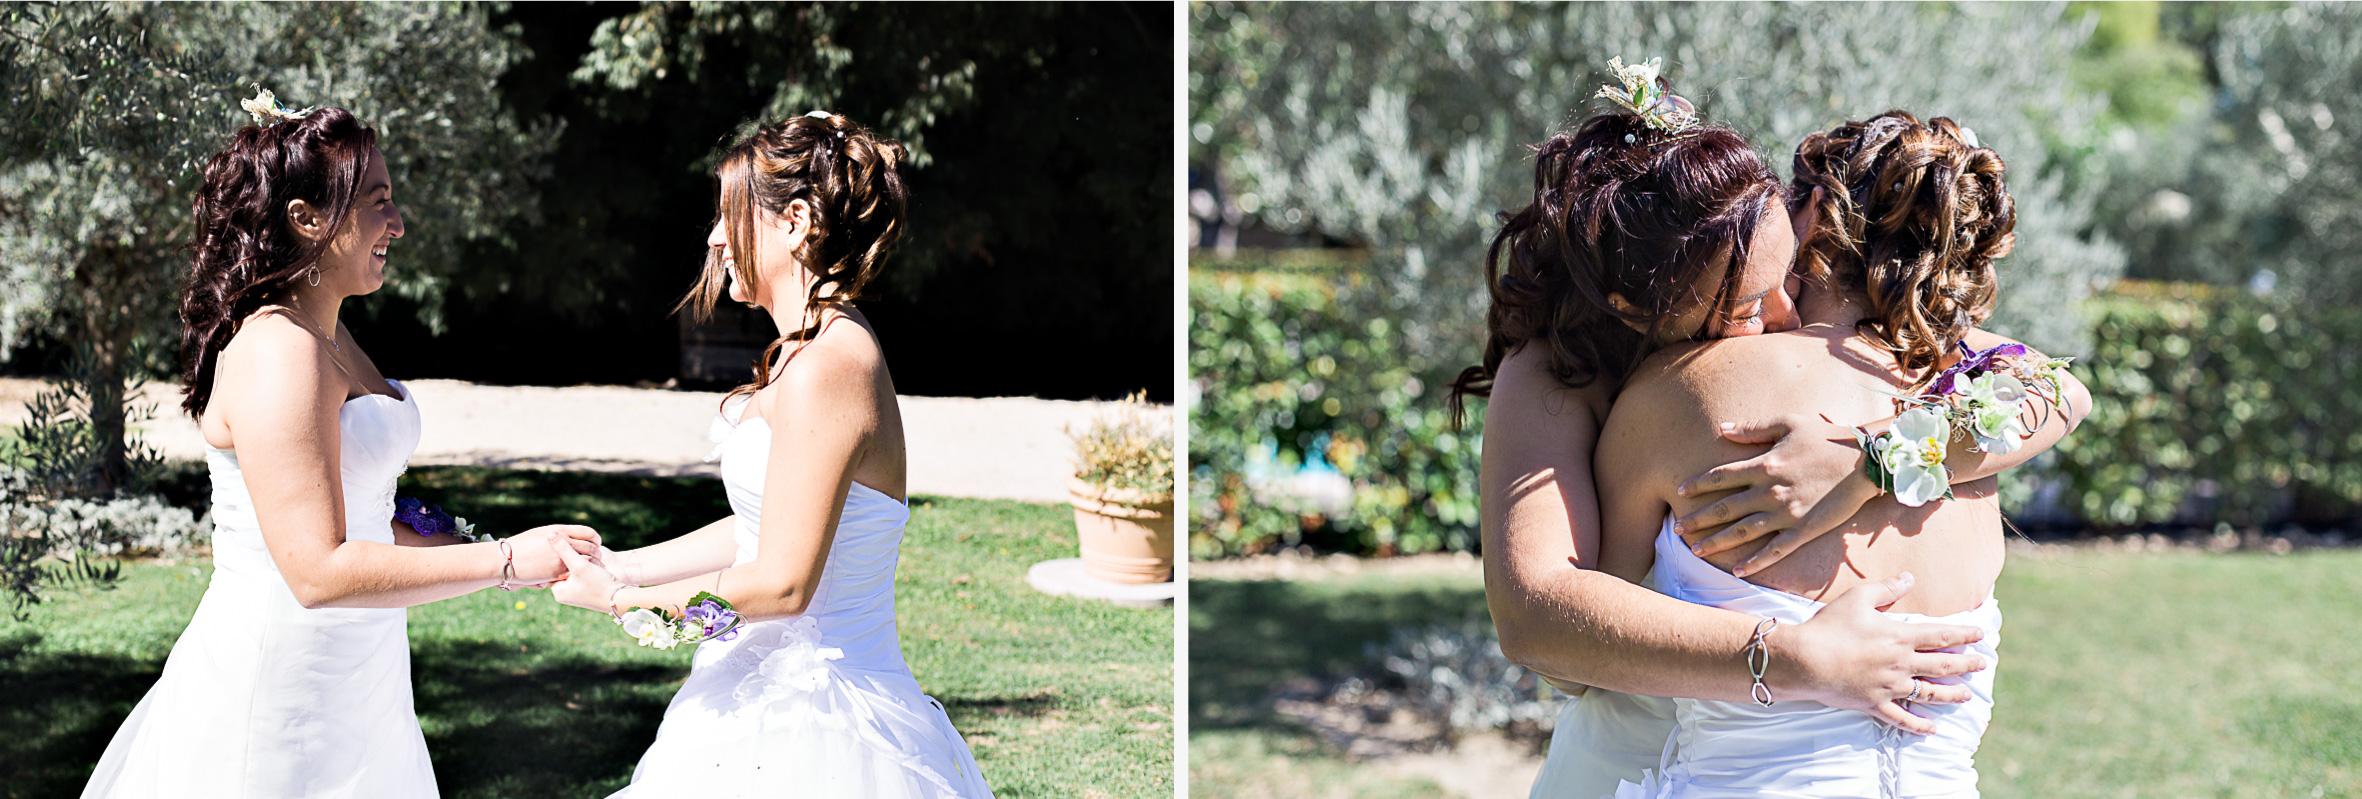 Photographe mariage avignon - Ambre & Amandine-12-2